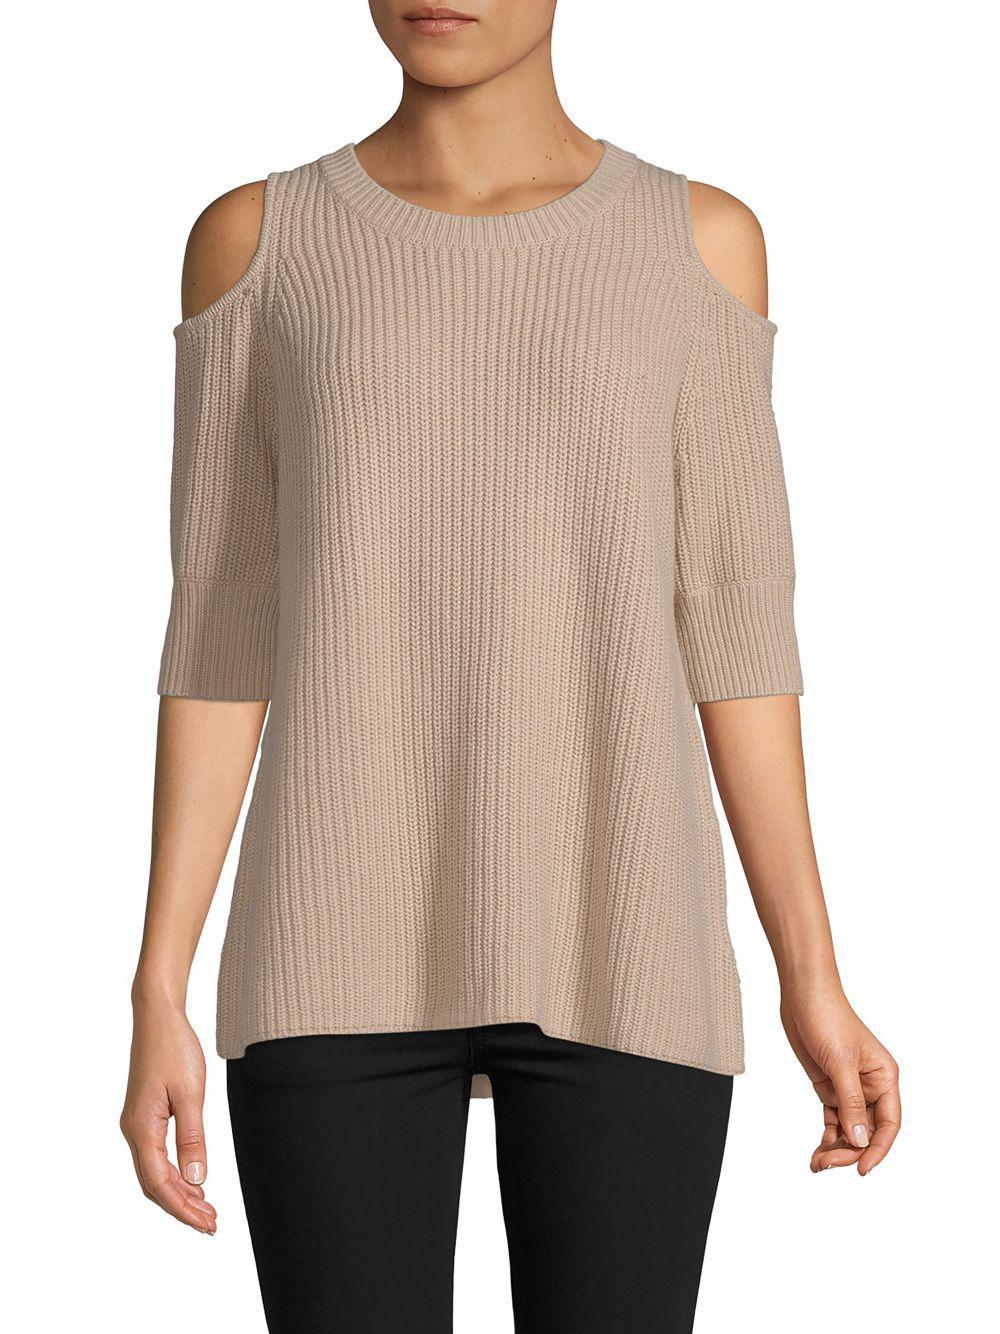 db58c65254a5 Lyst - Zoe Jordan Cashmere-blend Cold-shoulder Sweater in Natural